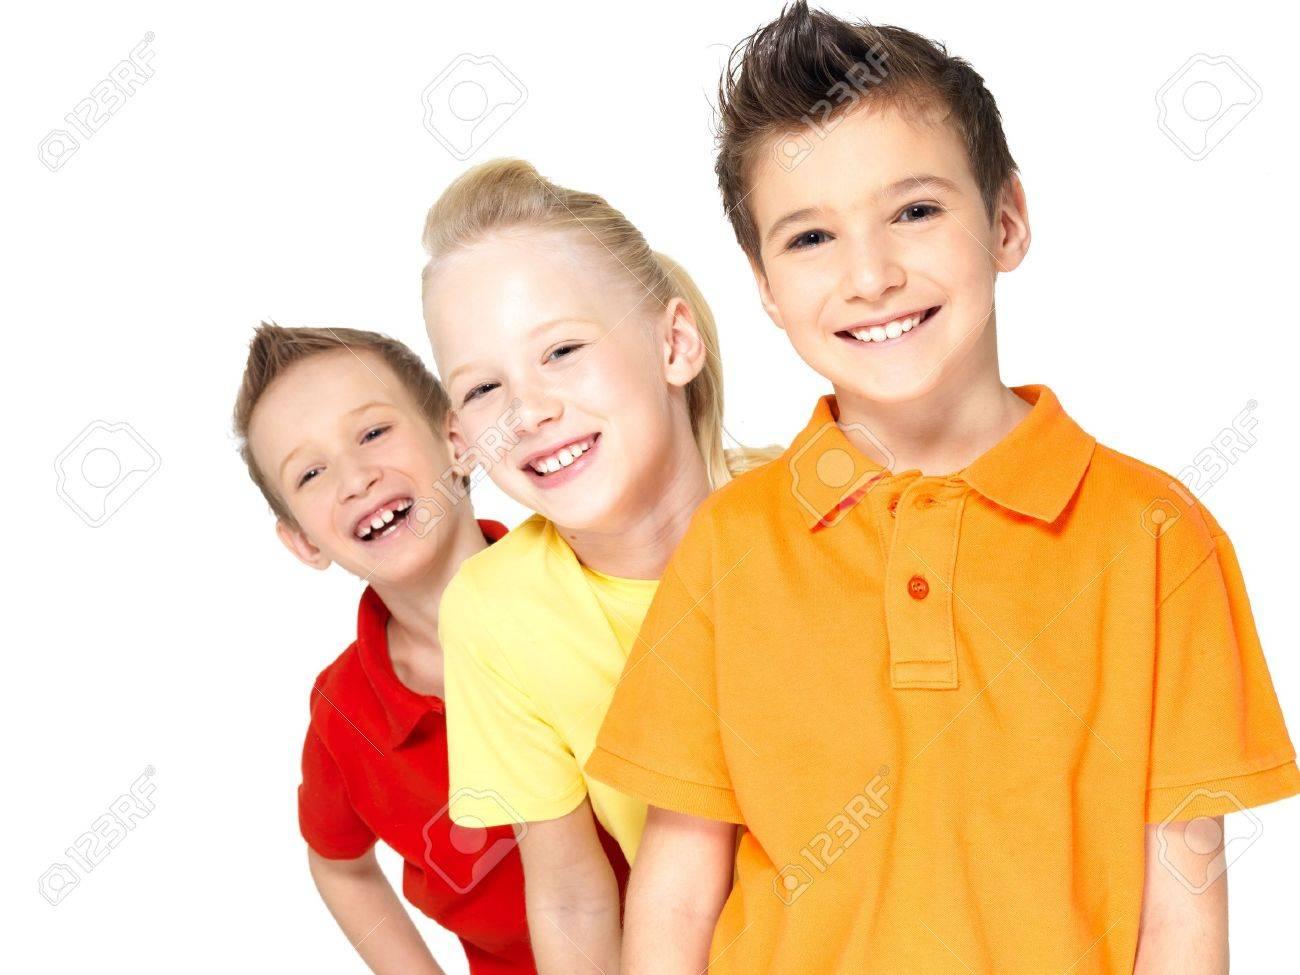 Portrait Of The Happy Children Isolated On White. Schoolchild ...